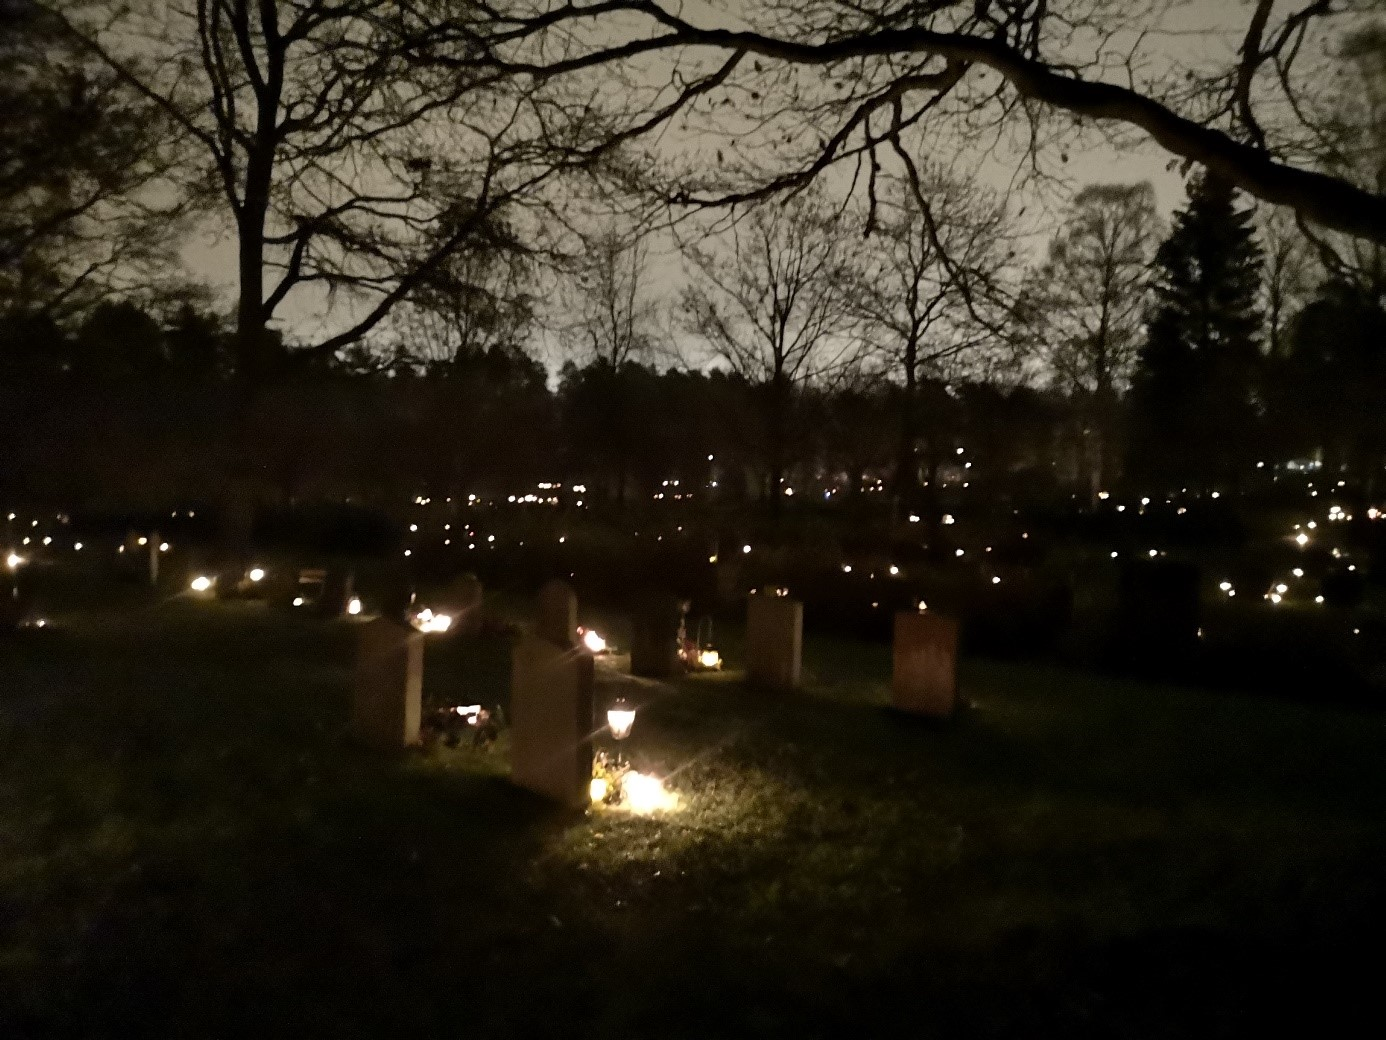 Sankt Eskils Kyrkogård cemetery Eskilstuna Sweden Overview